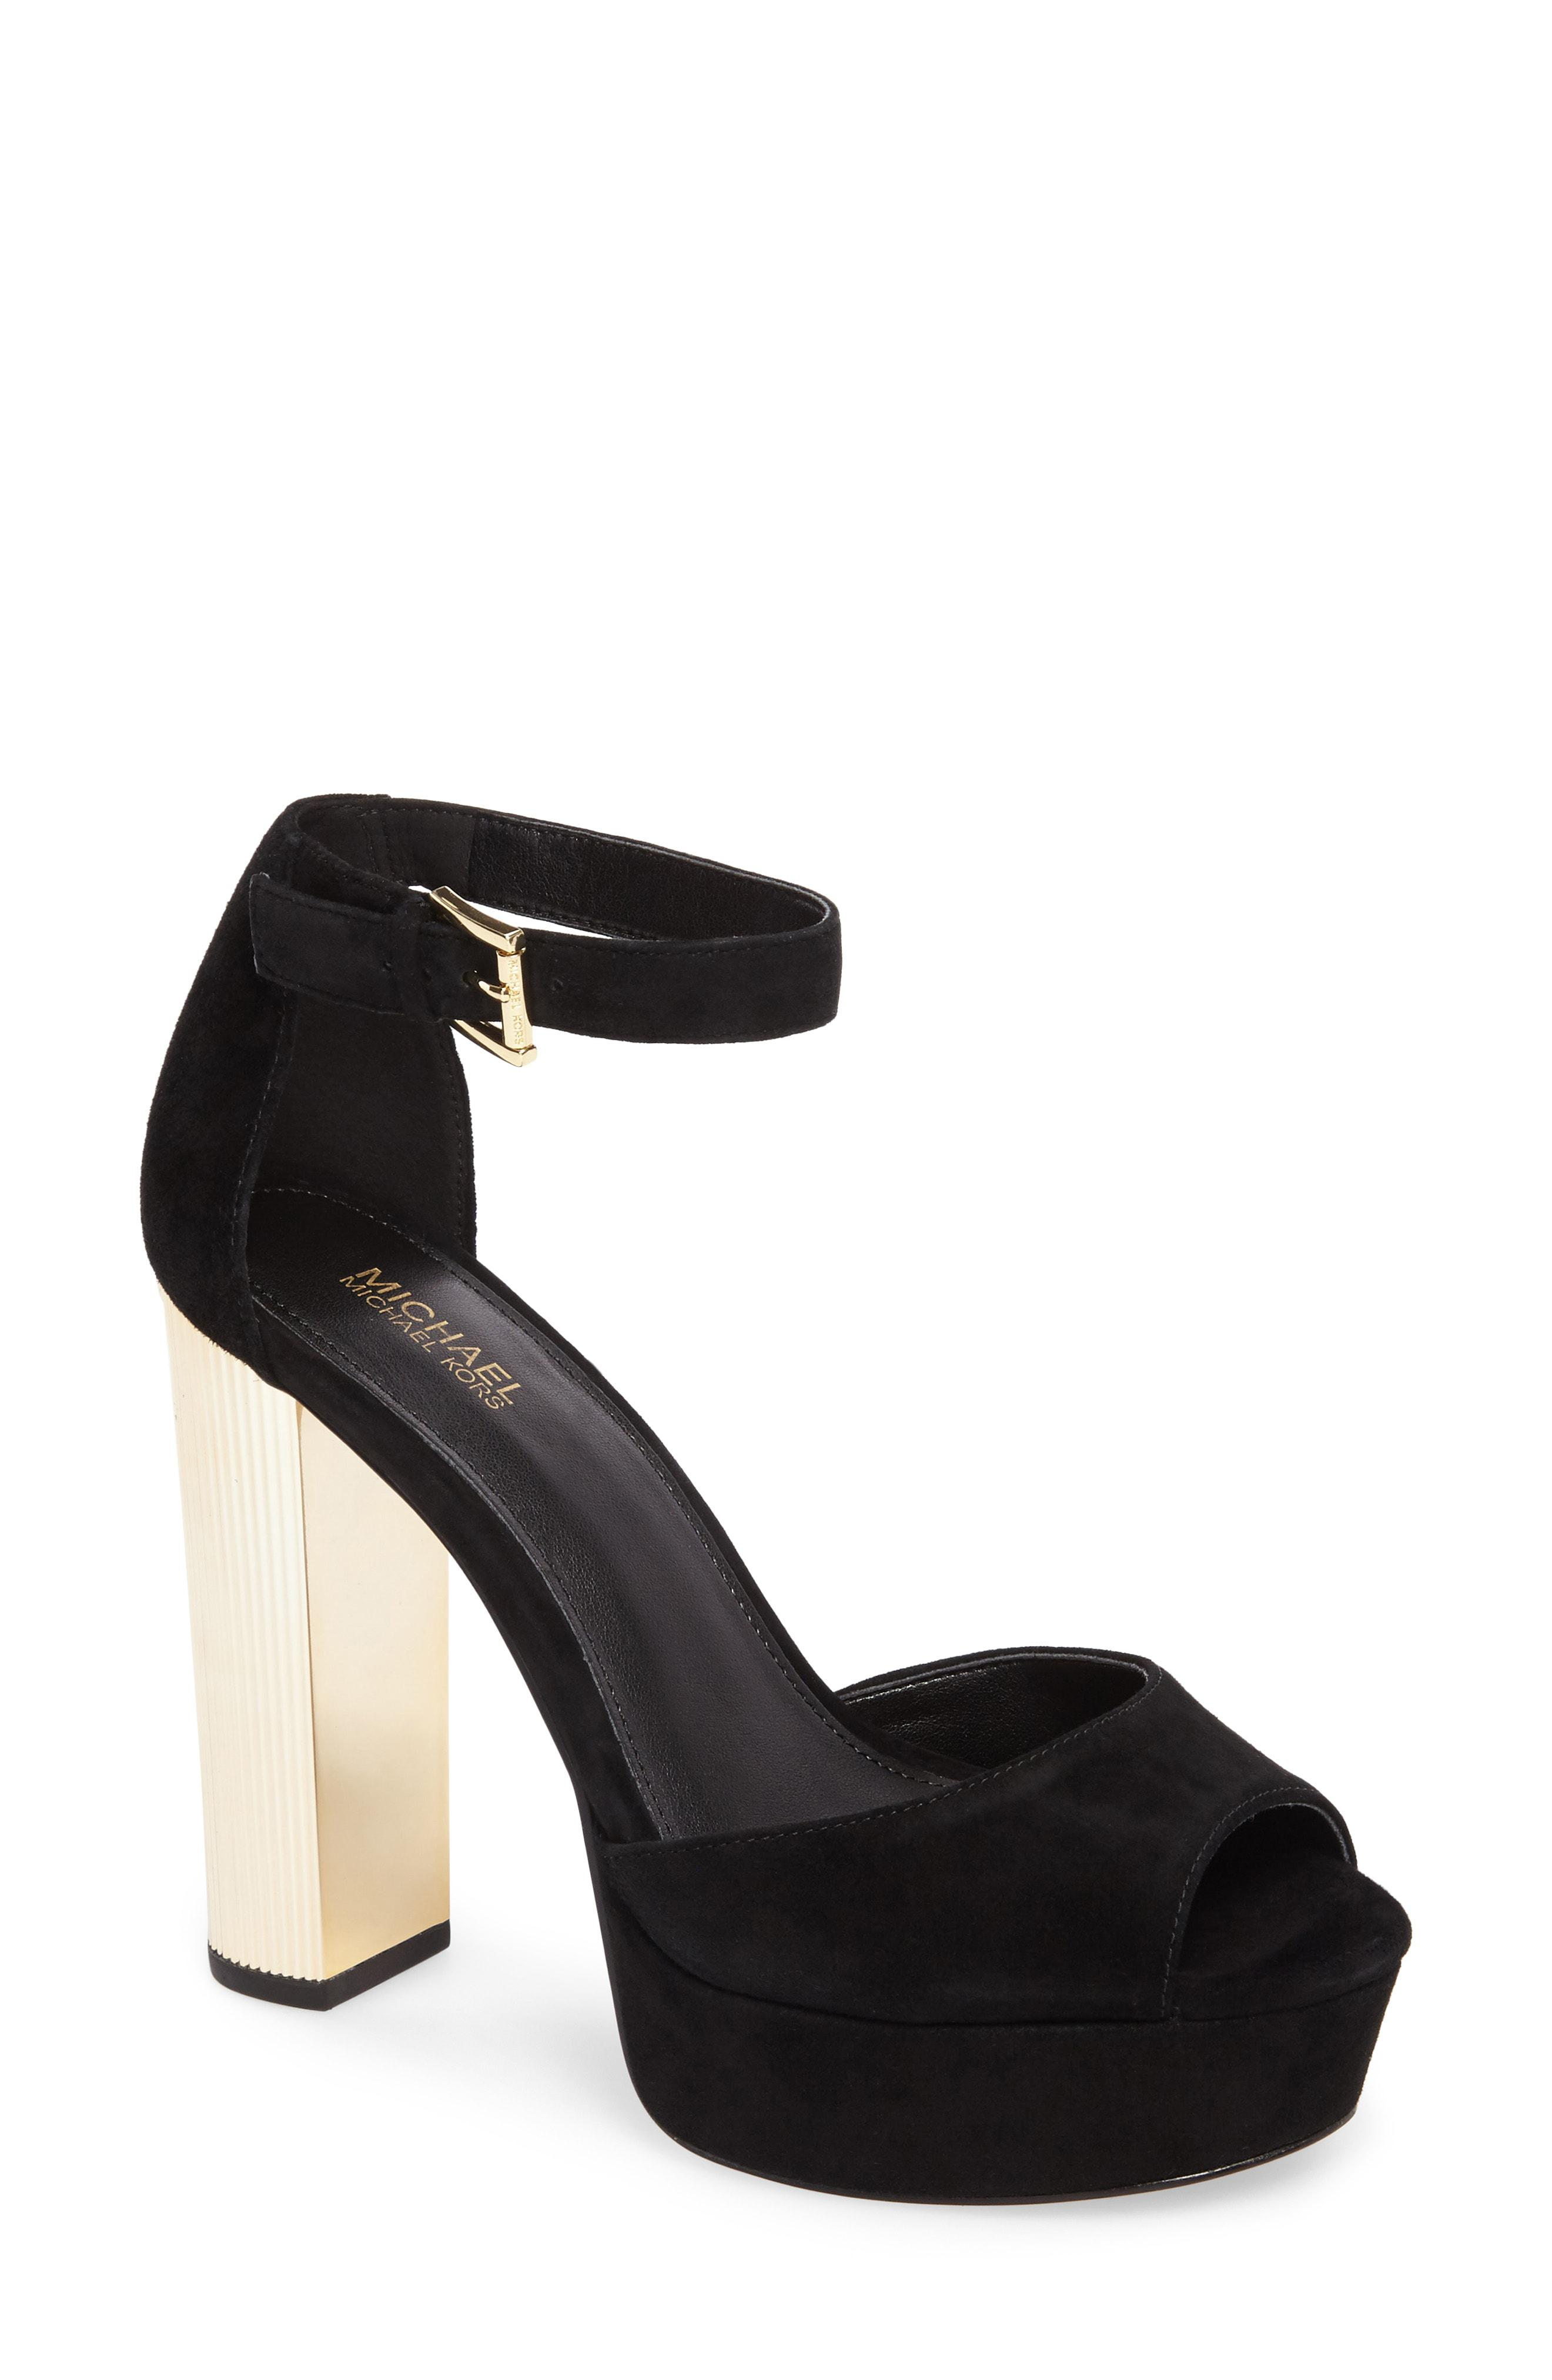 8546e4cc871a Lyst - MICHAEL Michael Kors Paloma Metallic Heel Platform Sandal in ...